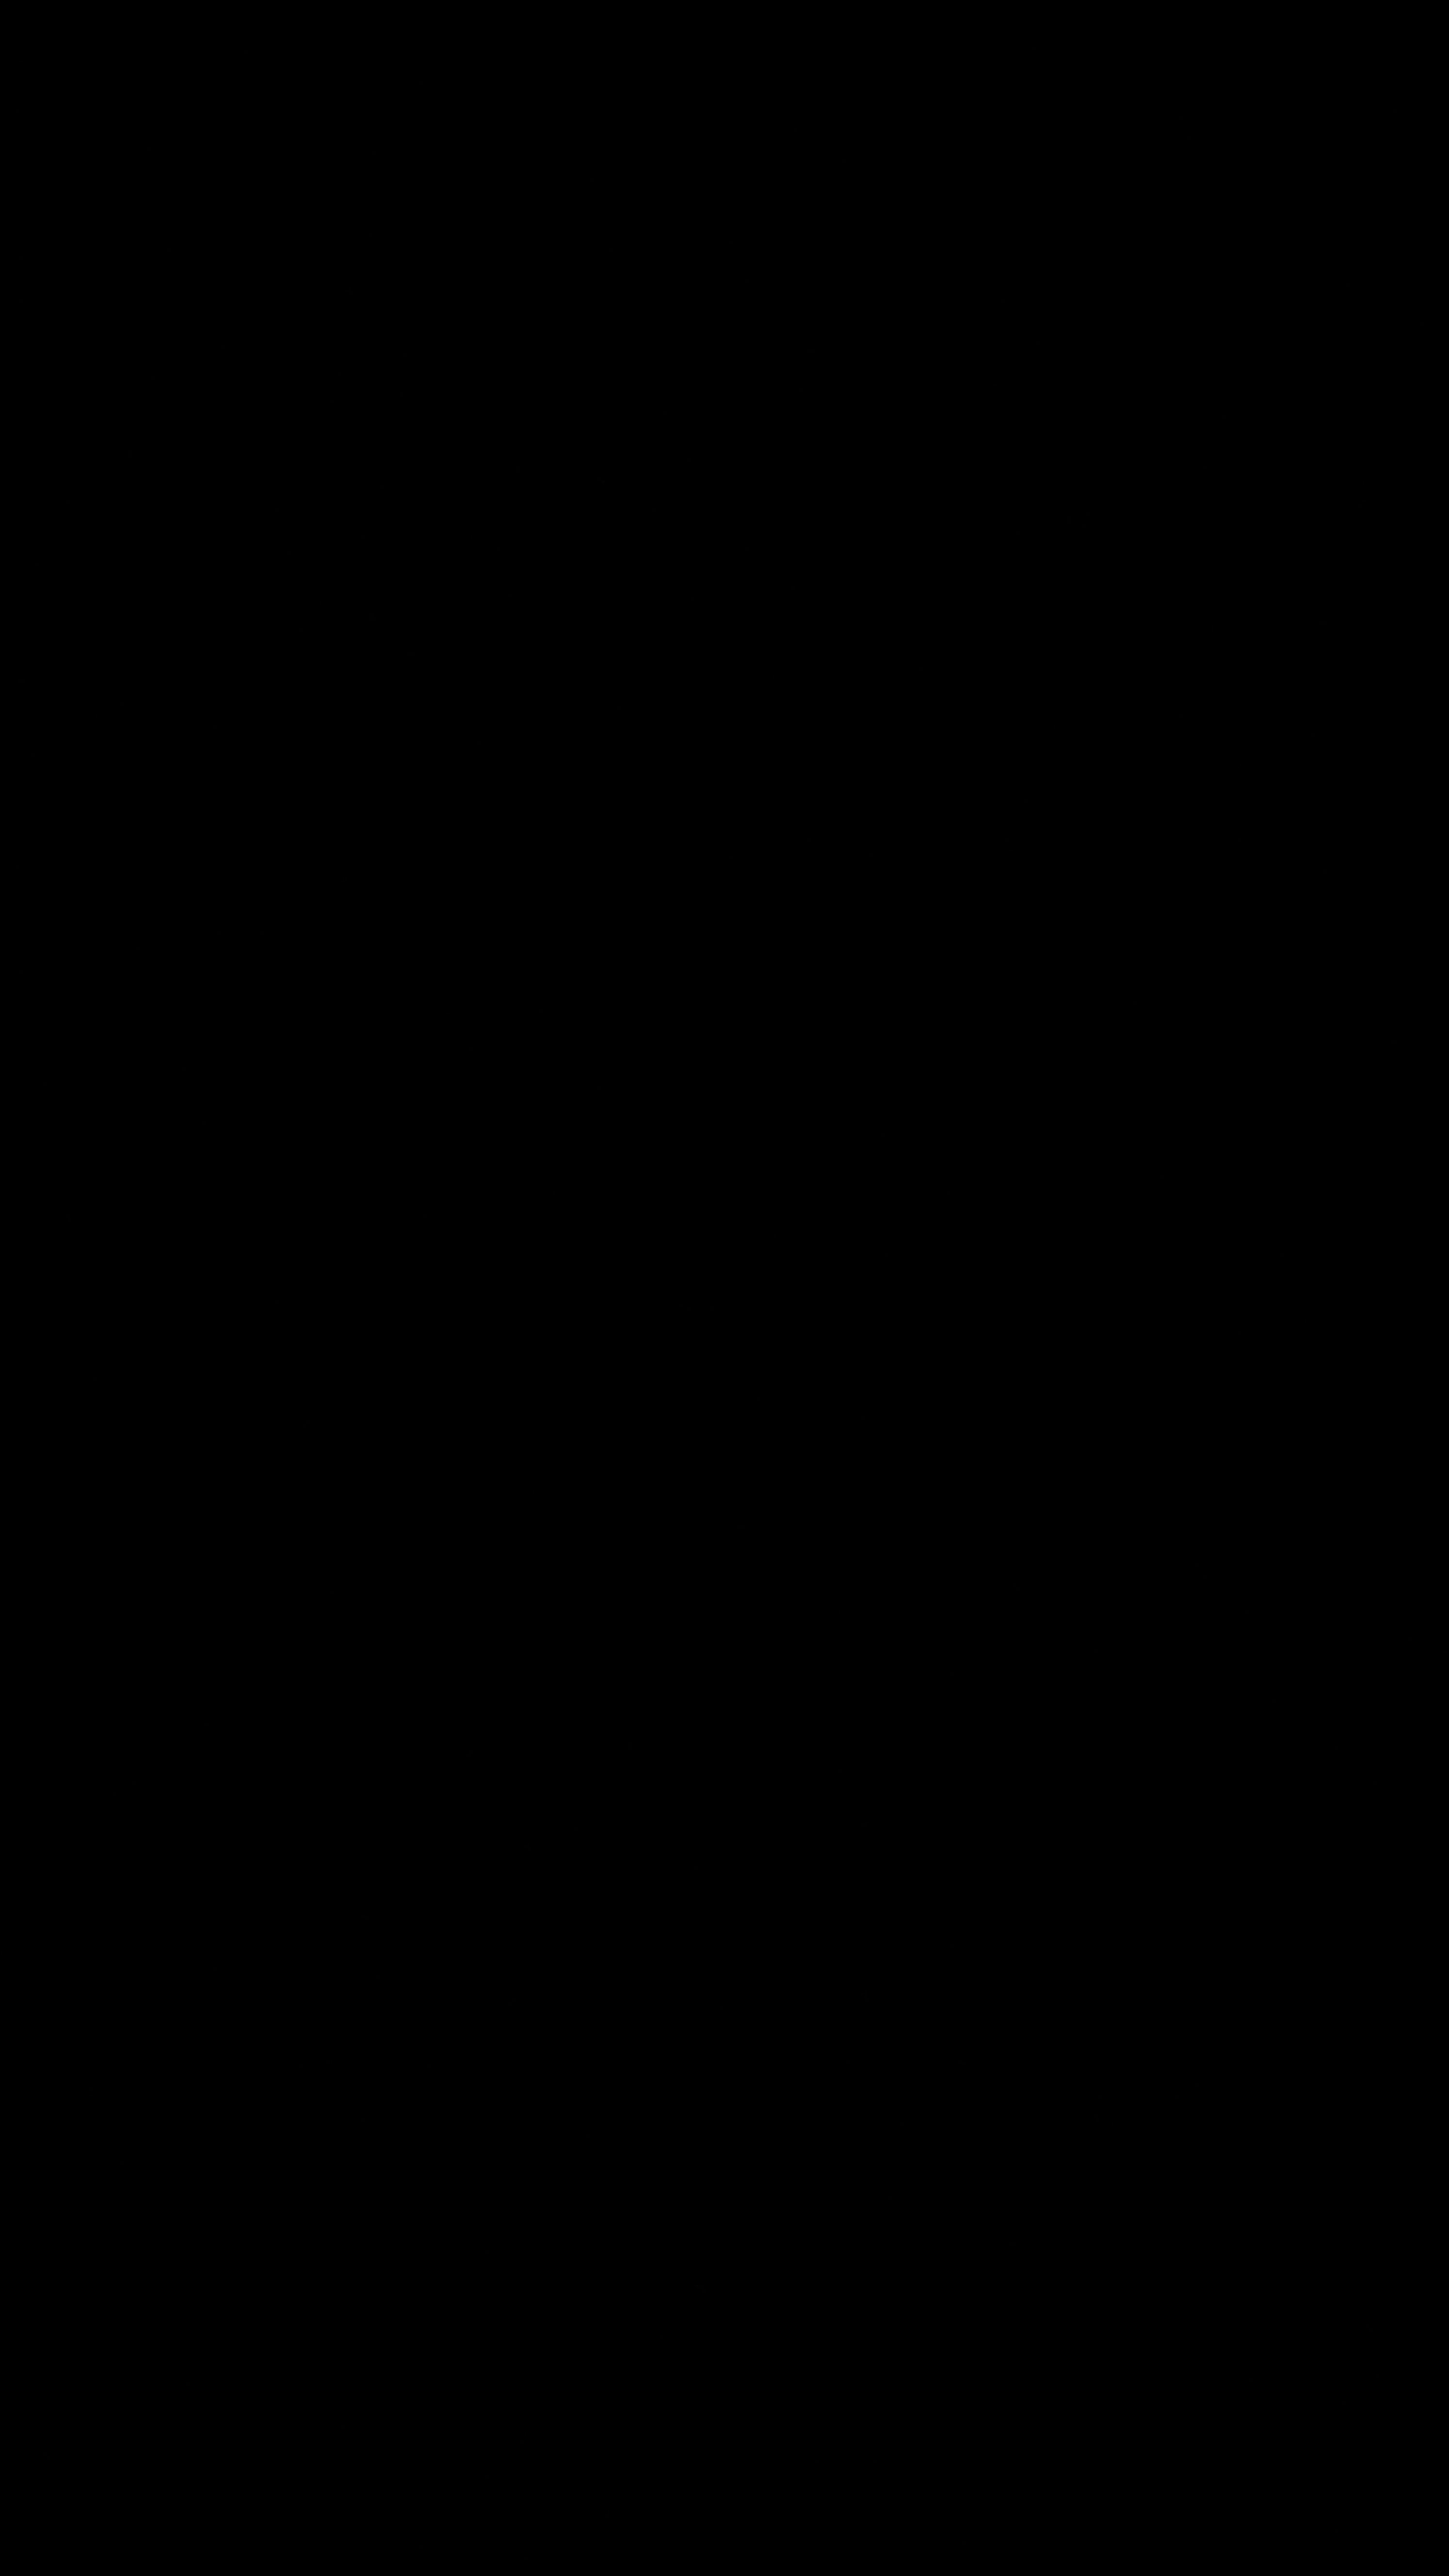 20170409_013818